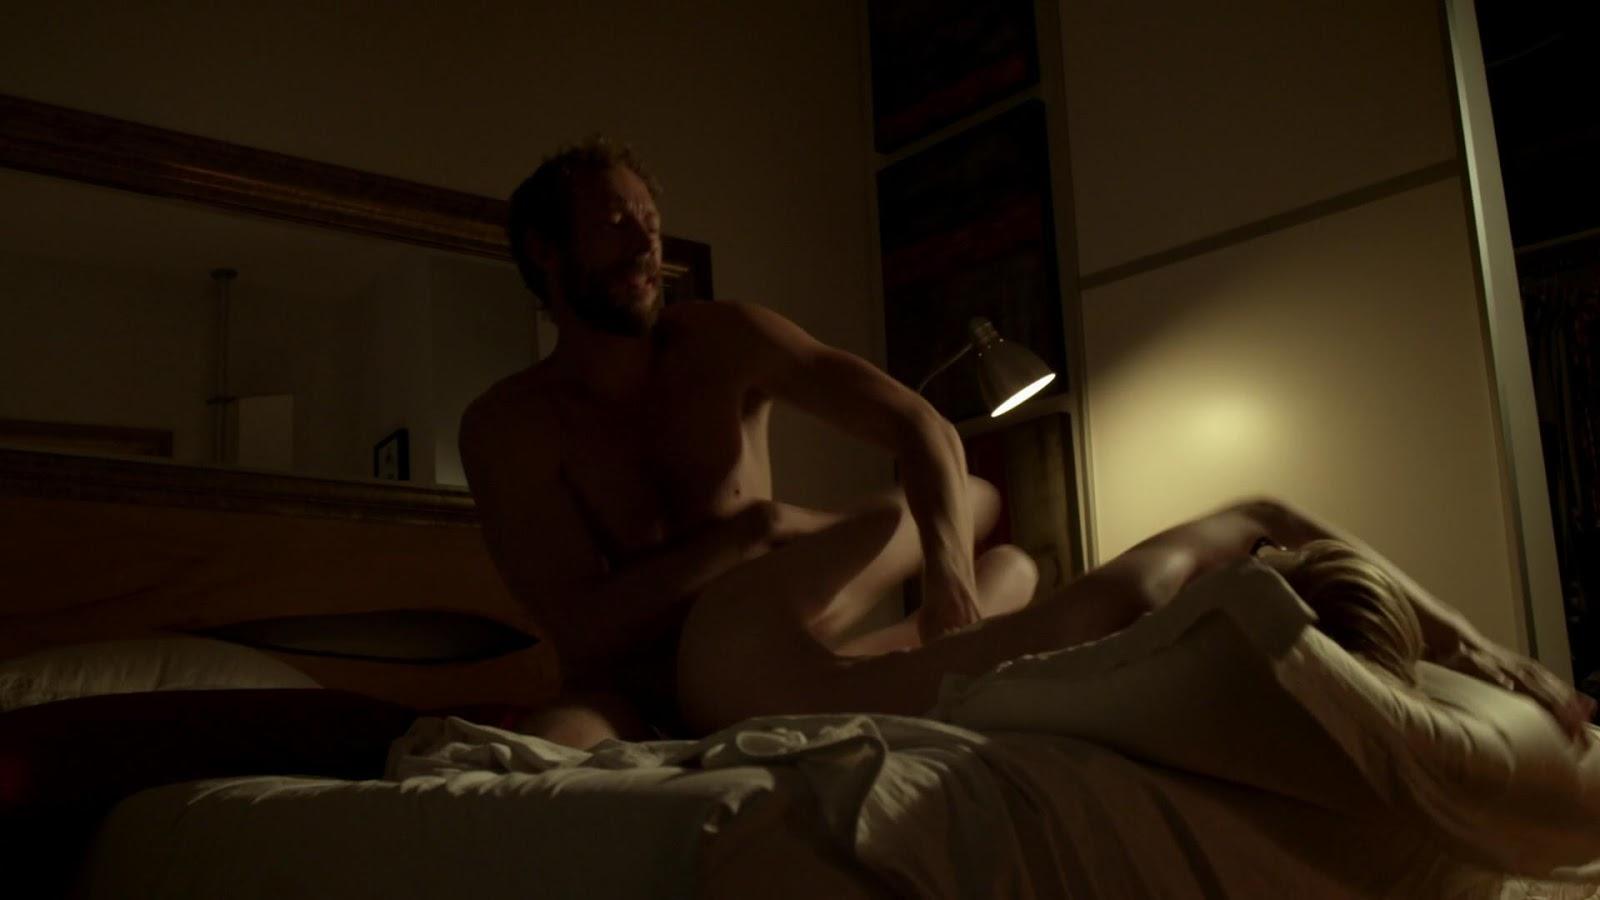 Bikini Kris Holden Ried Nude Pictures